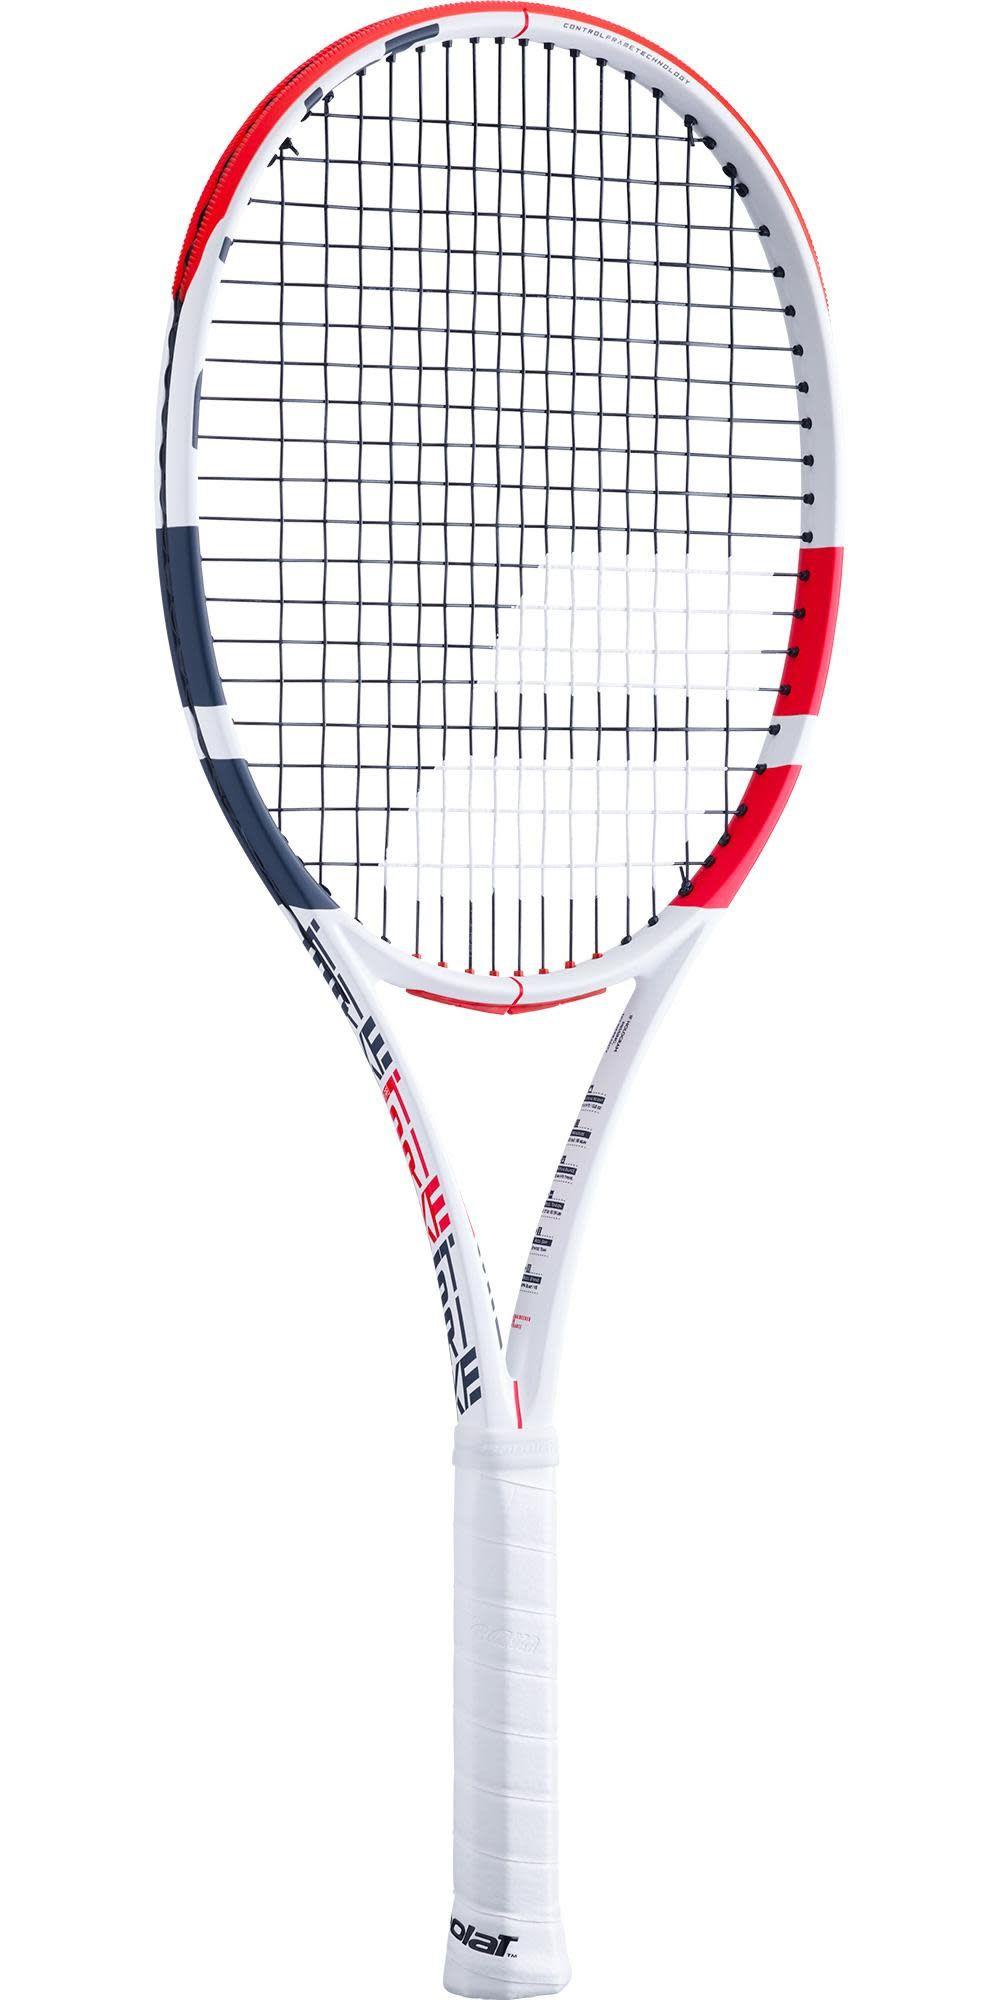 Raquete de Tênis Babolat Pure Strike 16x19 2019